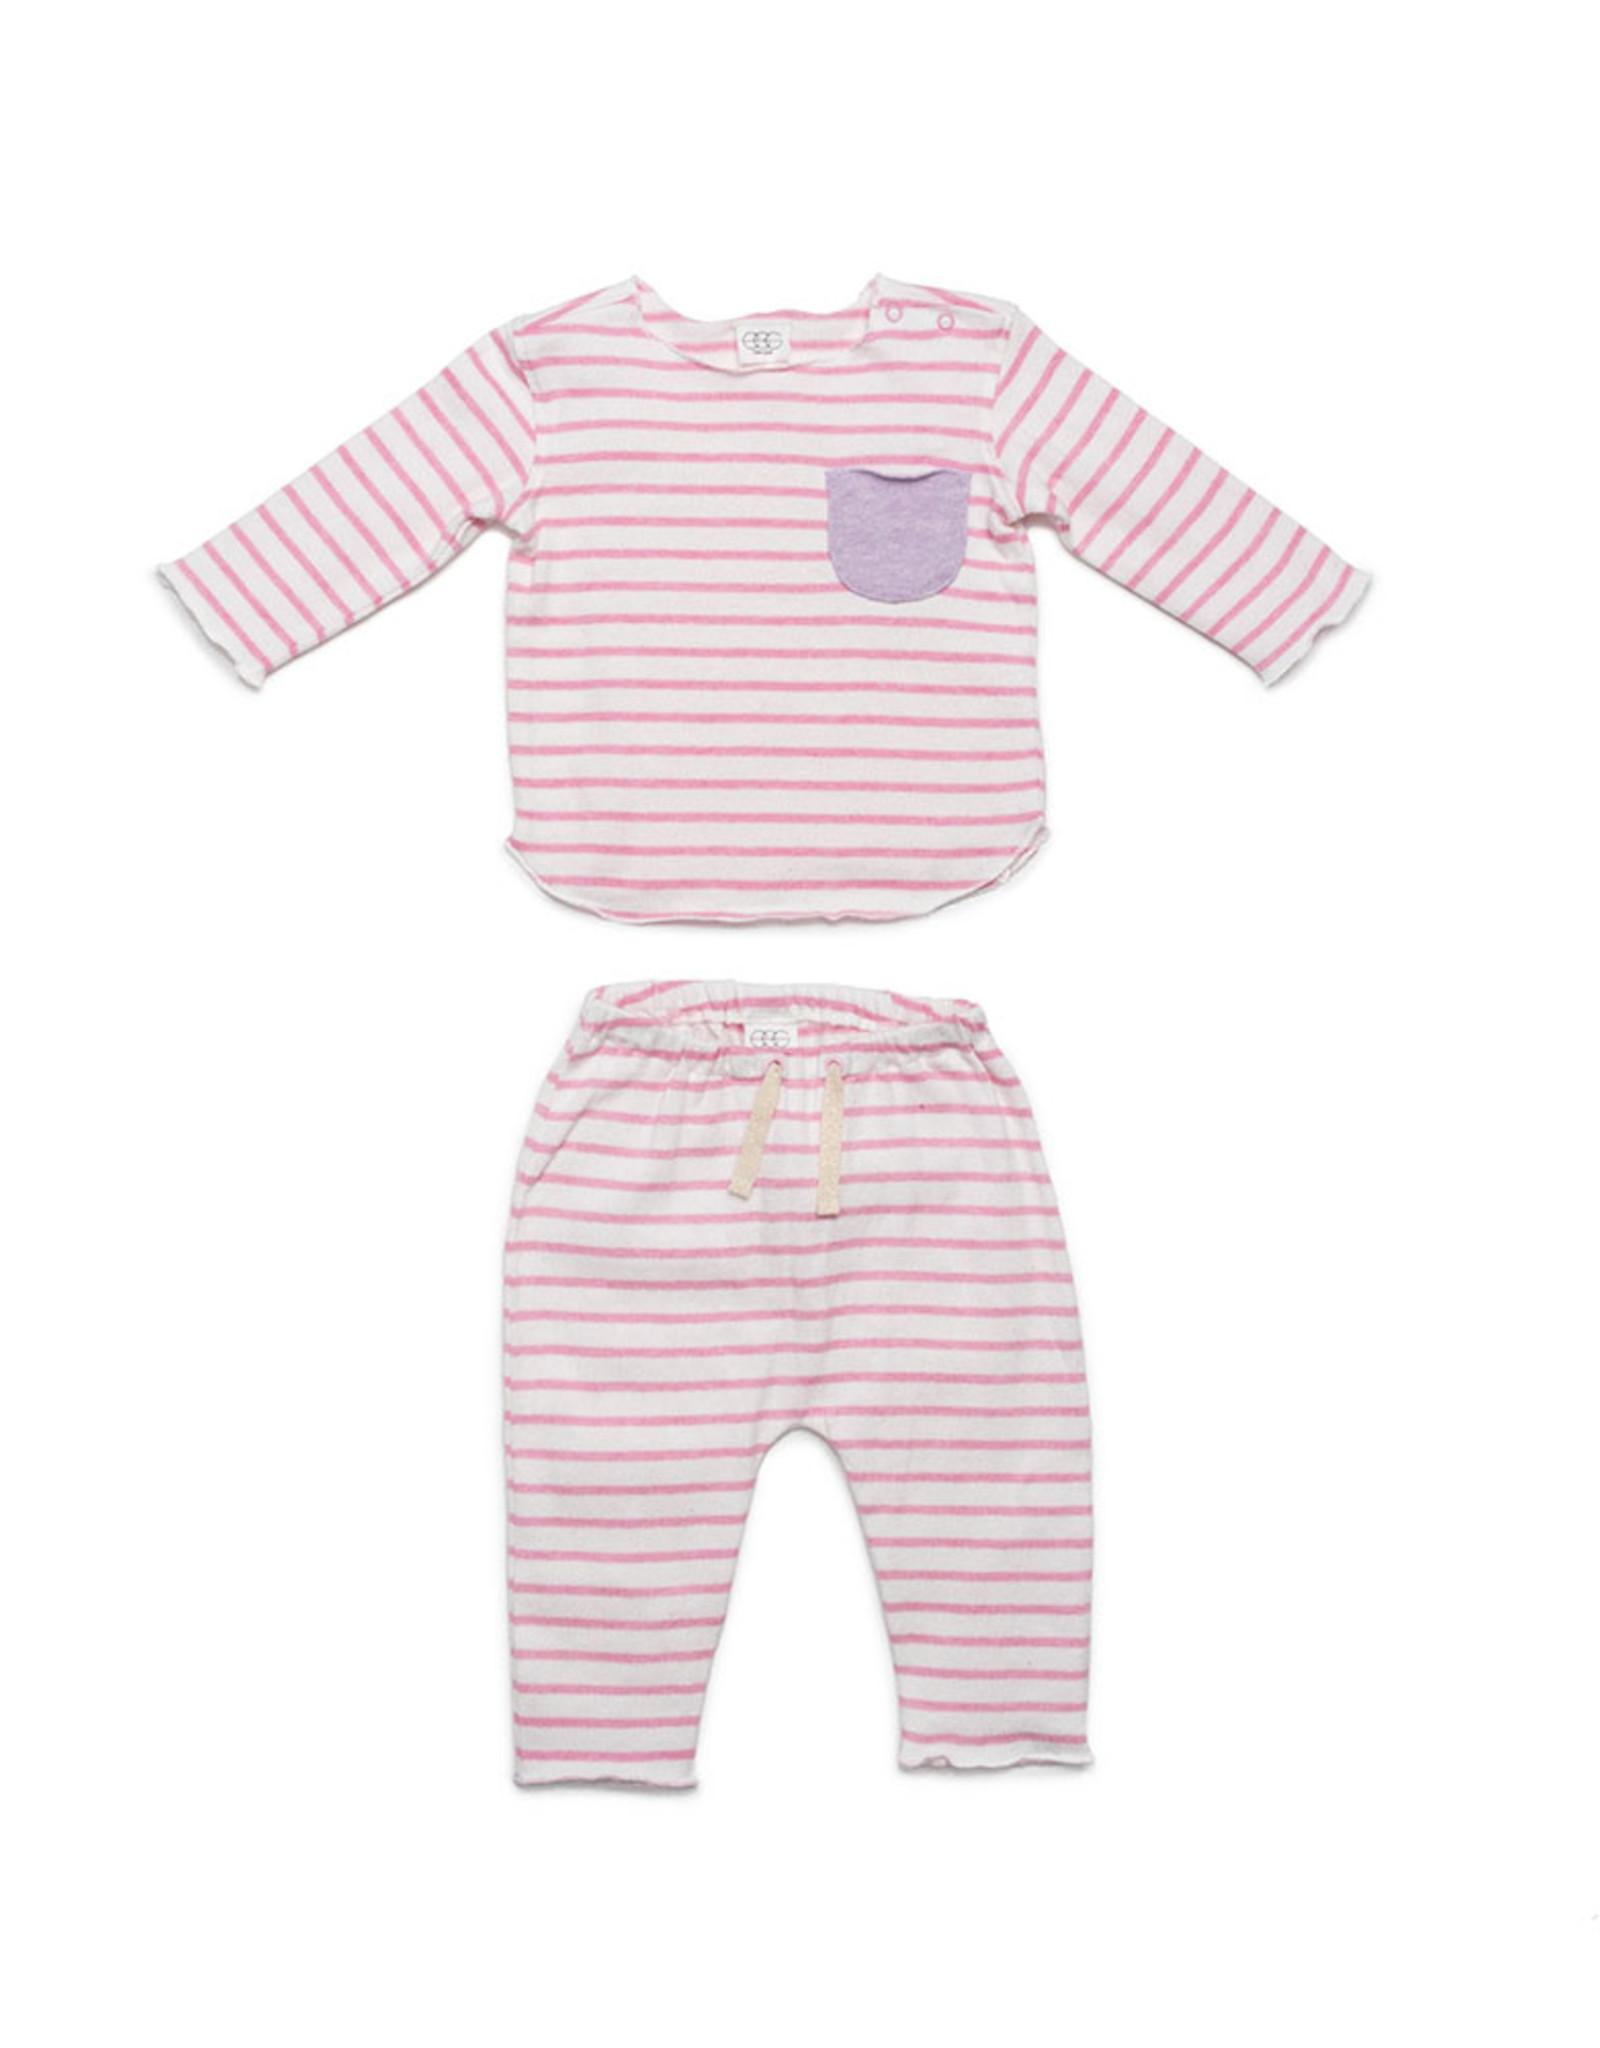 EGG New York Bobbi Set Pink Stripe